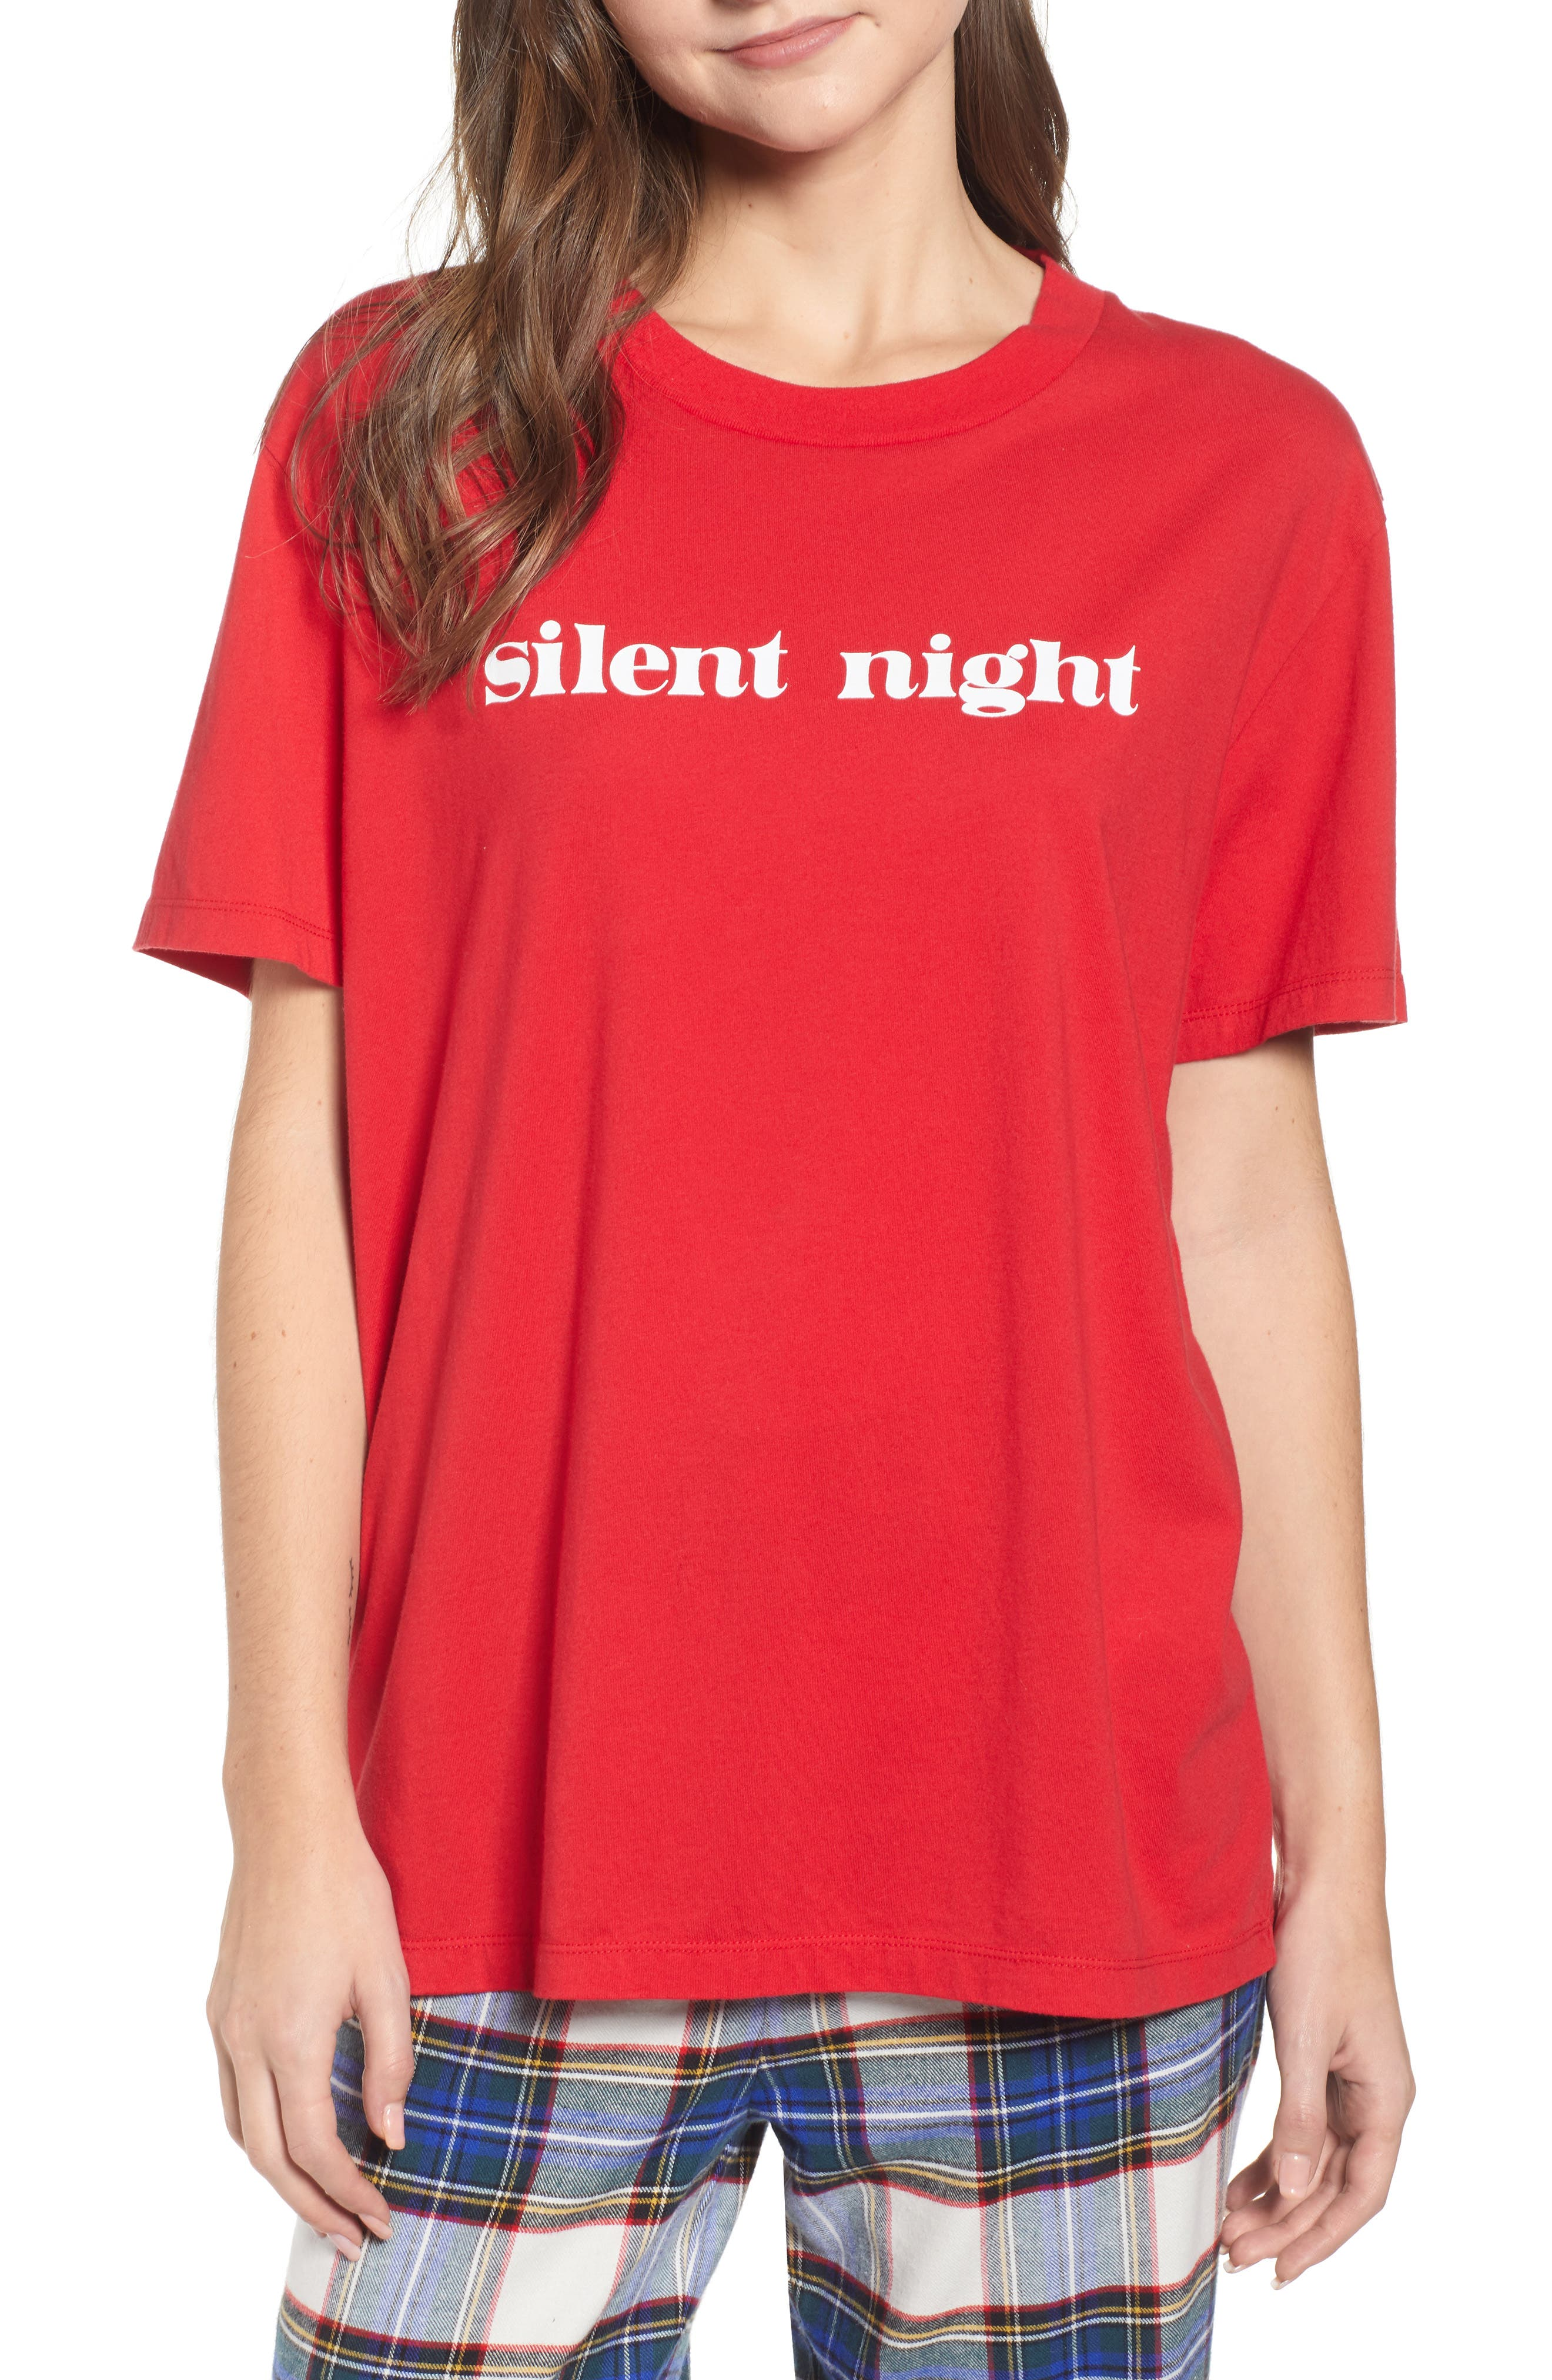 SLEEPY JONES Silent Night Tee, Main, color, RED